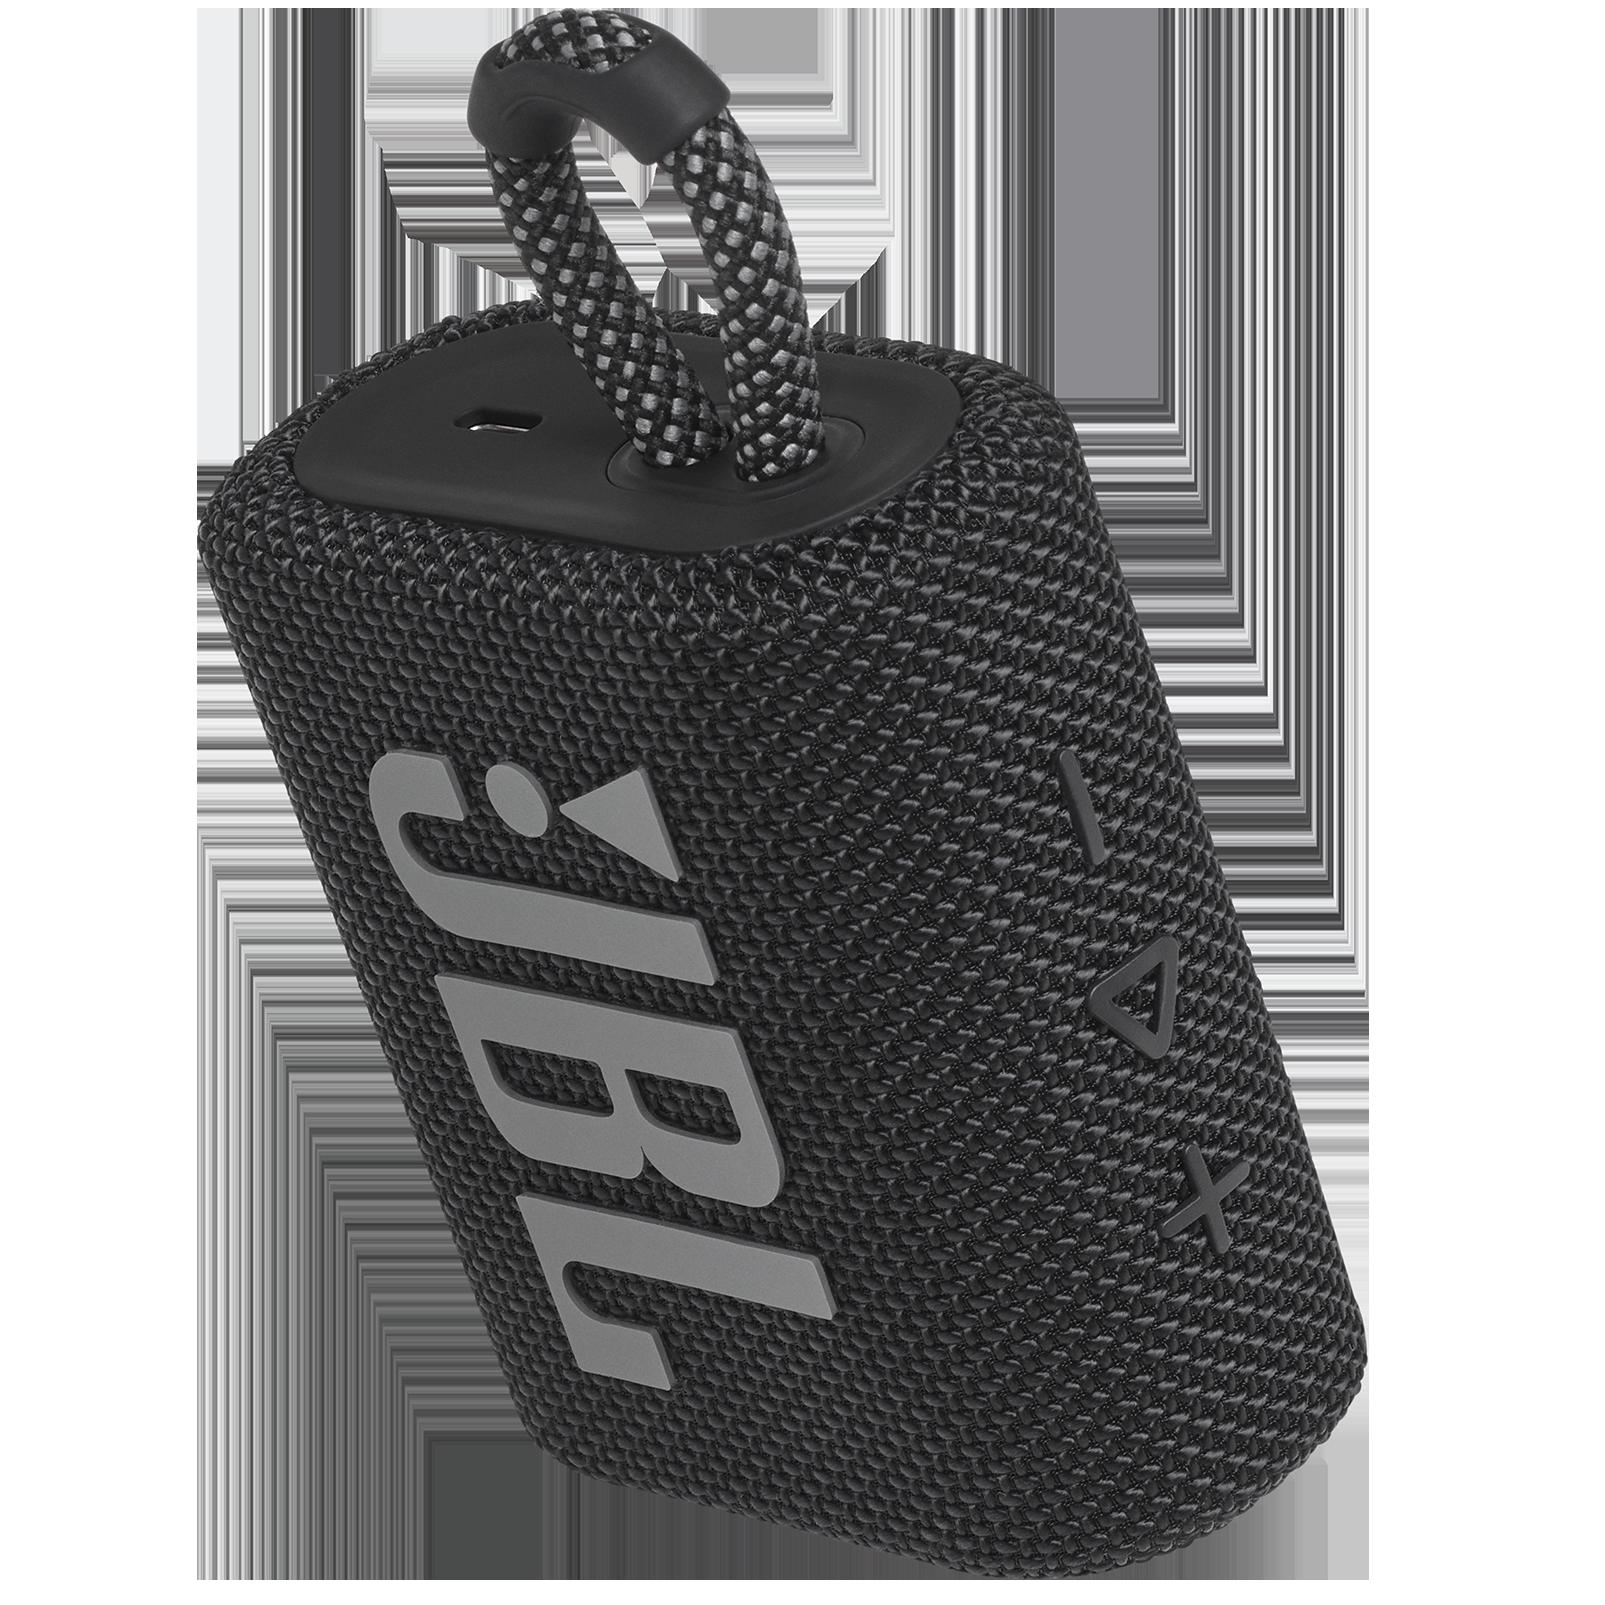 JBL Go 3 - Black - Portable Waterproof Speaker - Detailshot 2